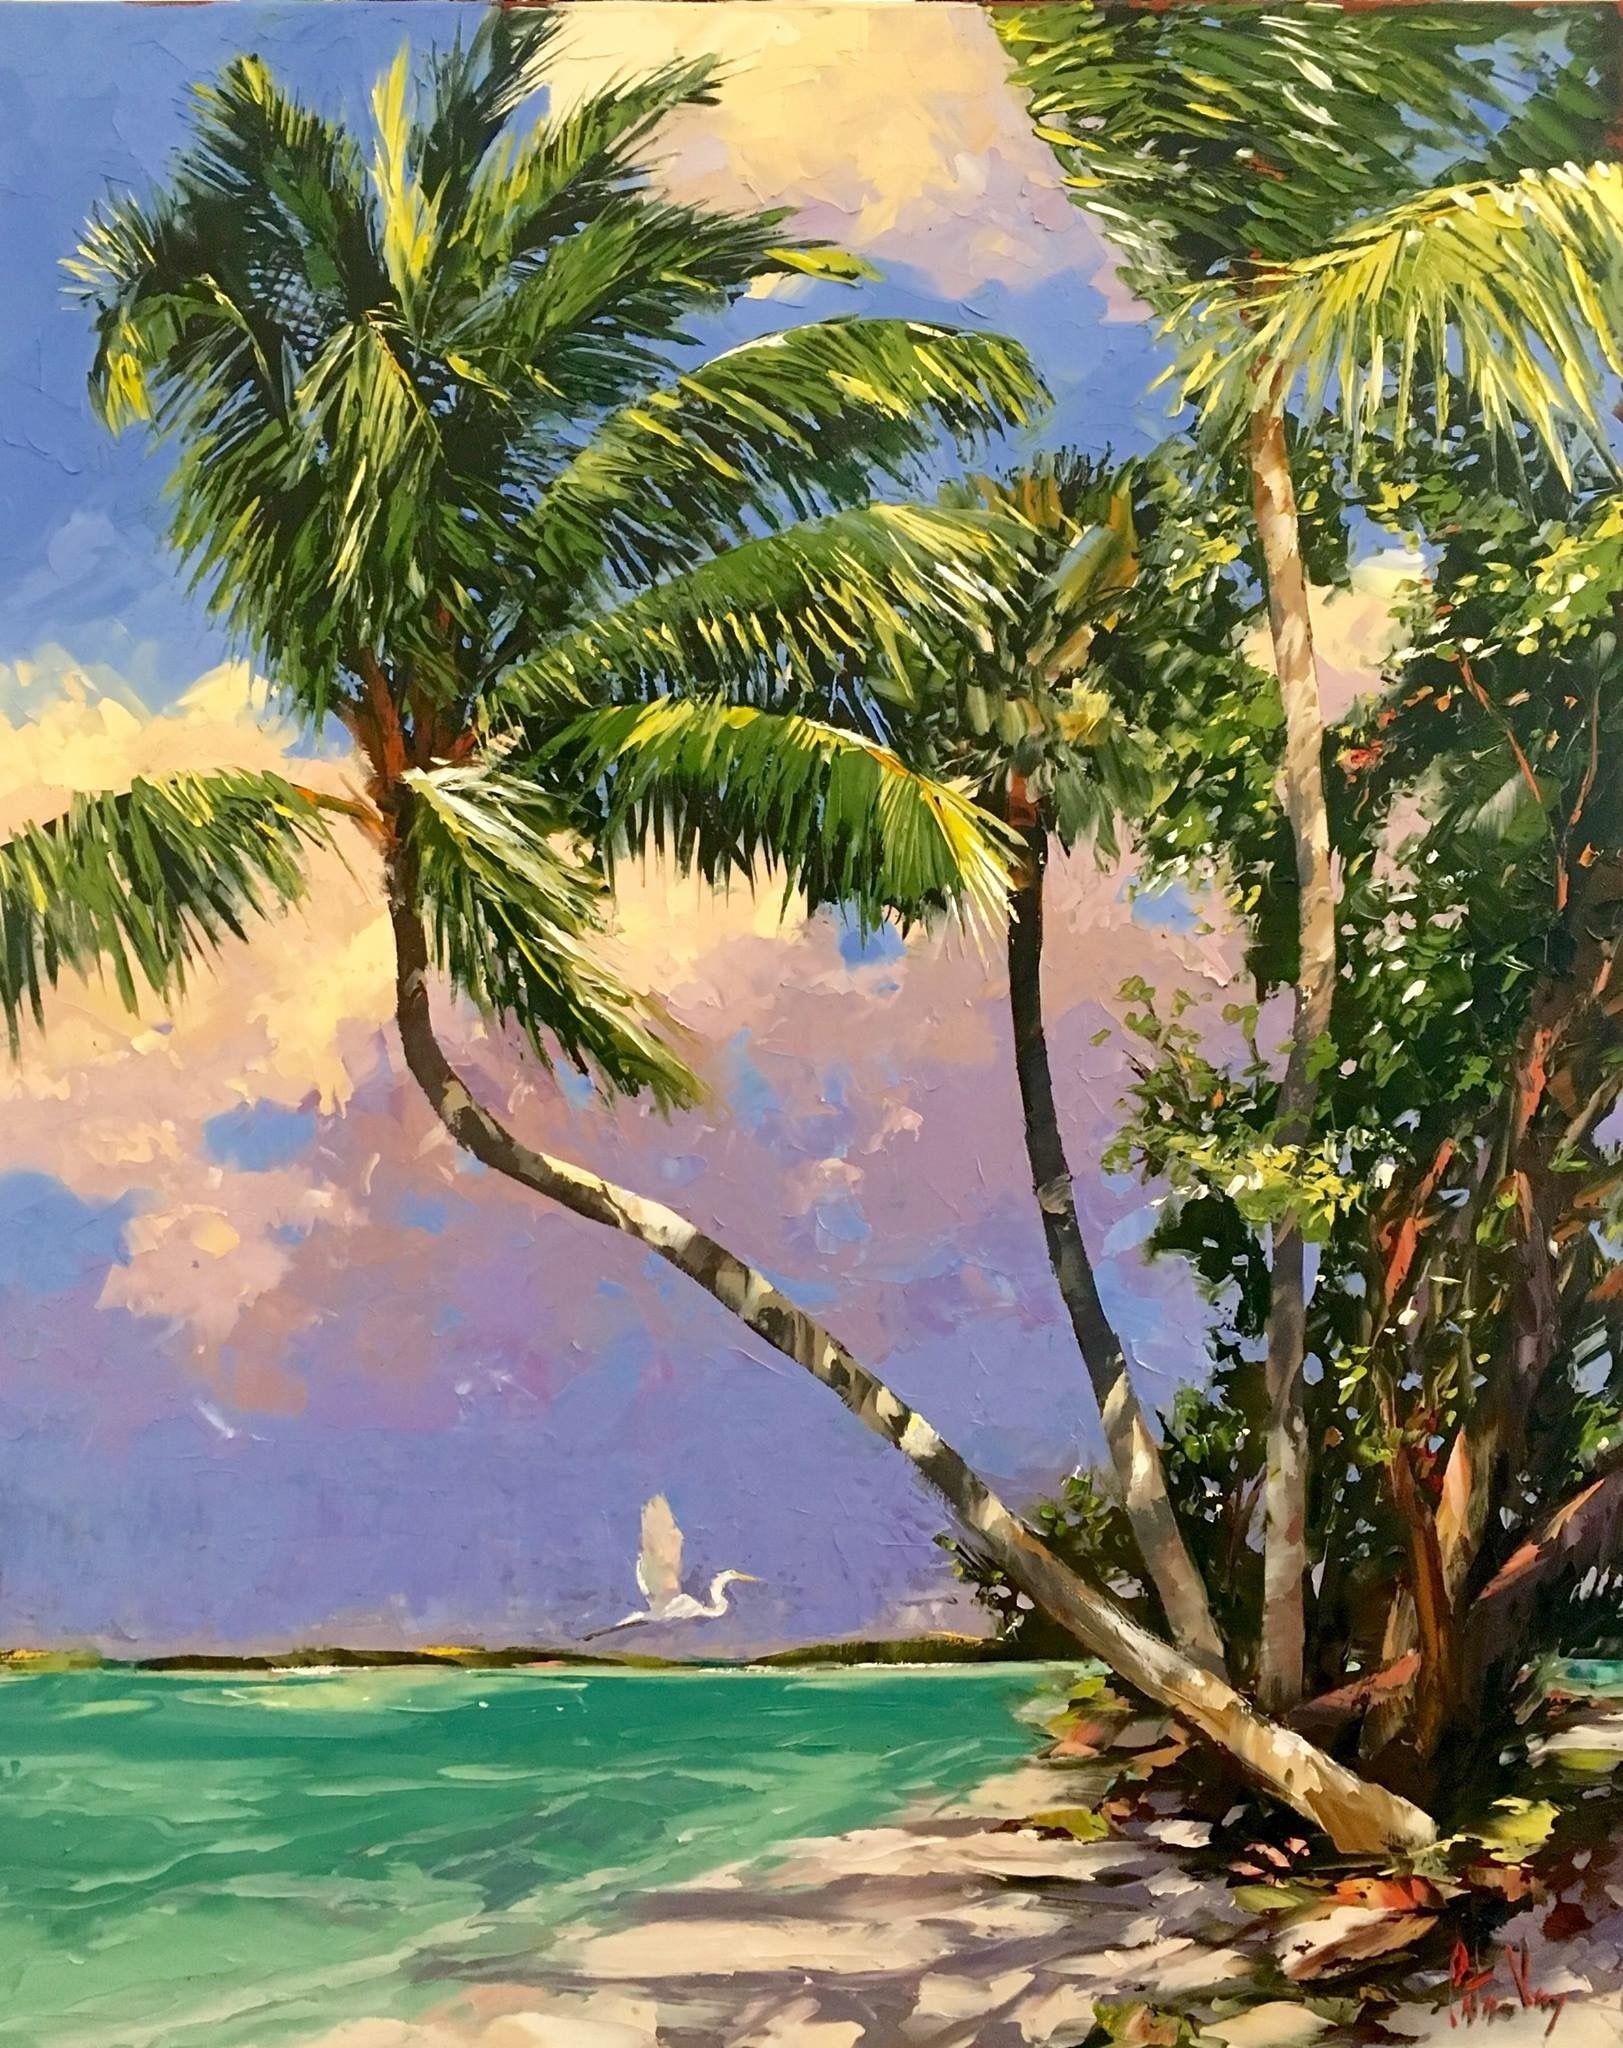 Watercolor artist magazine palm coast fl - Peter Vey In Flight